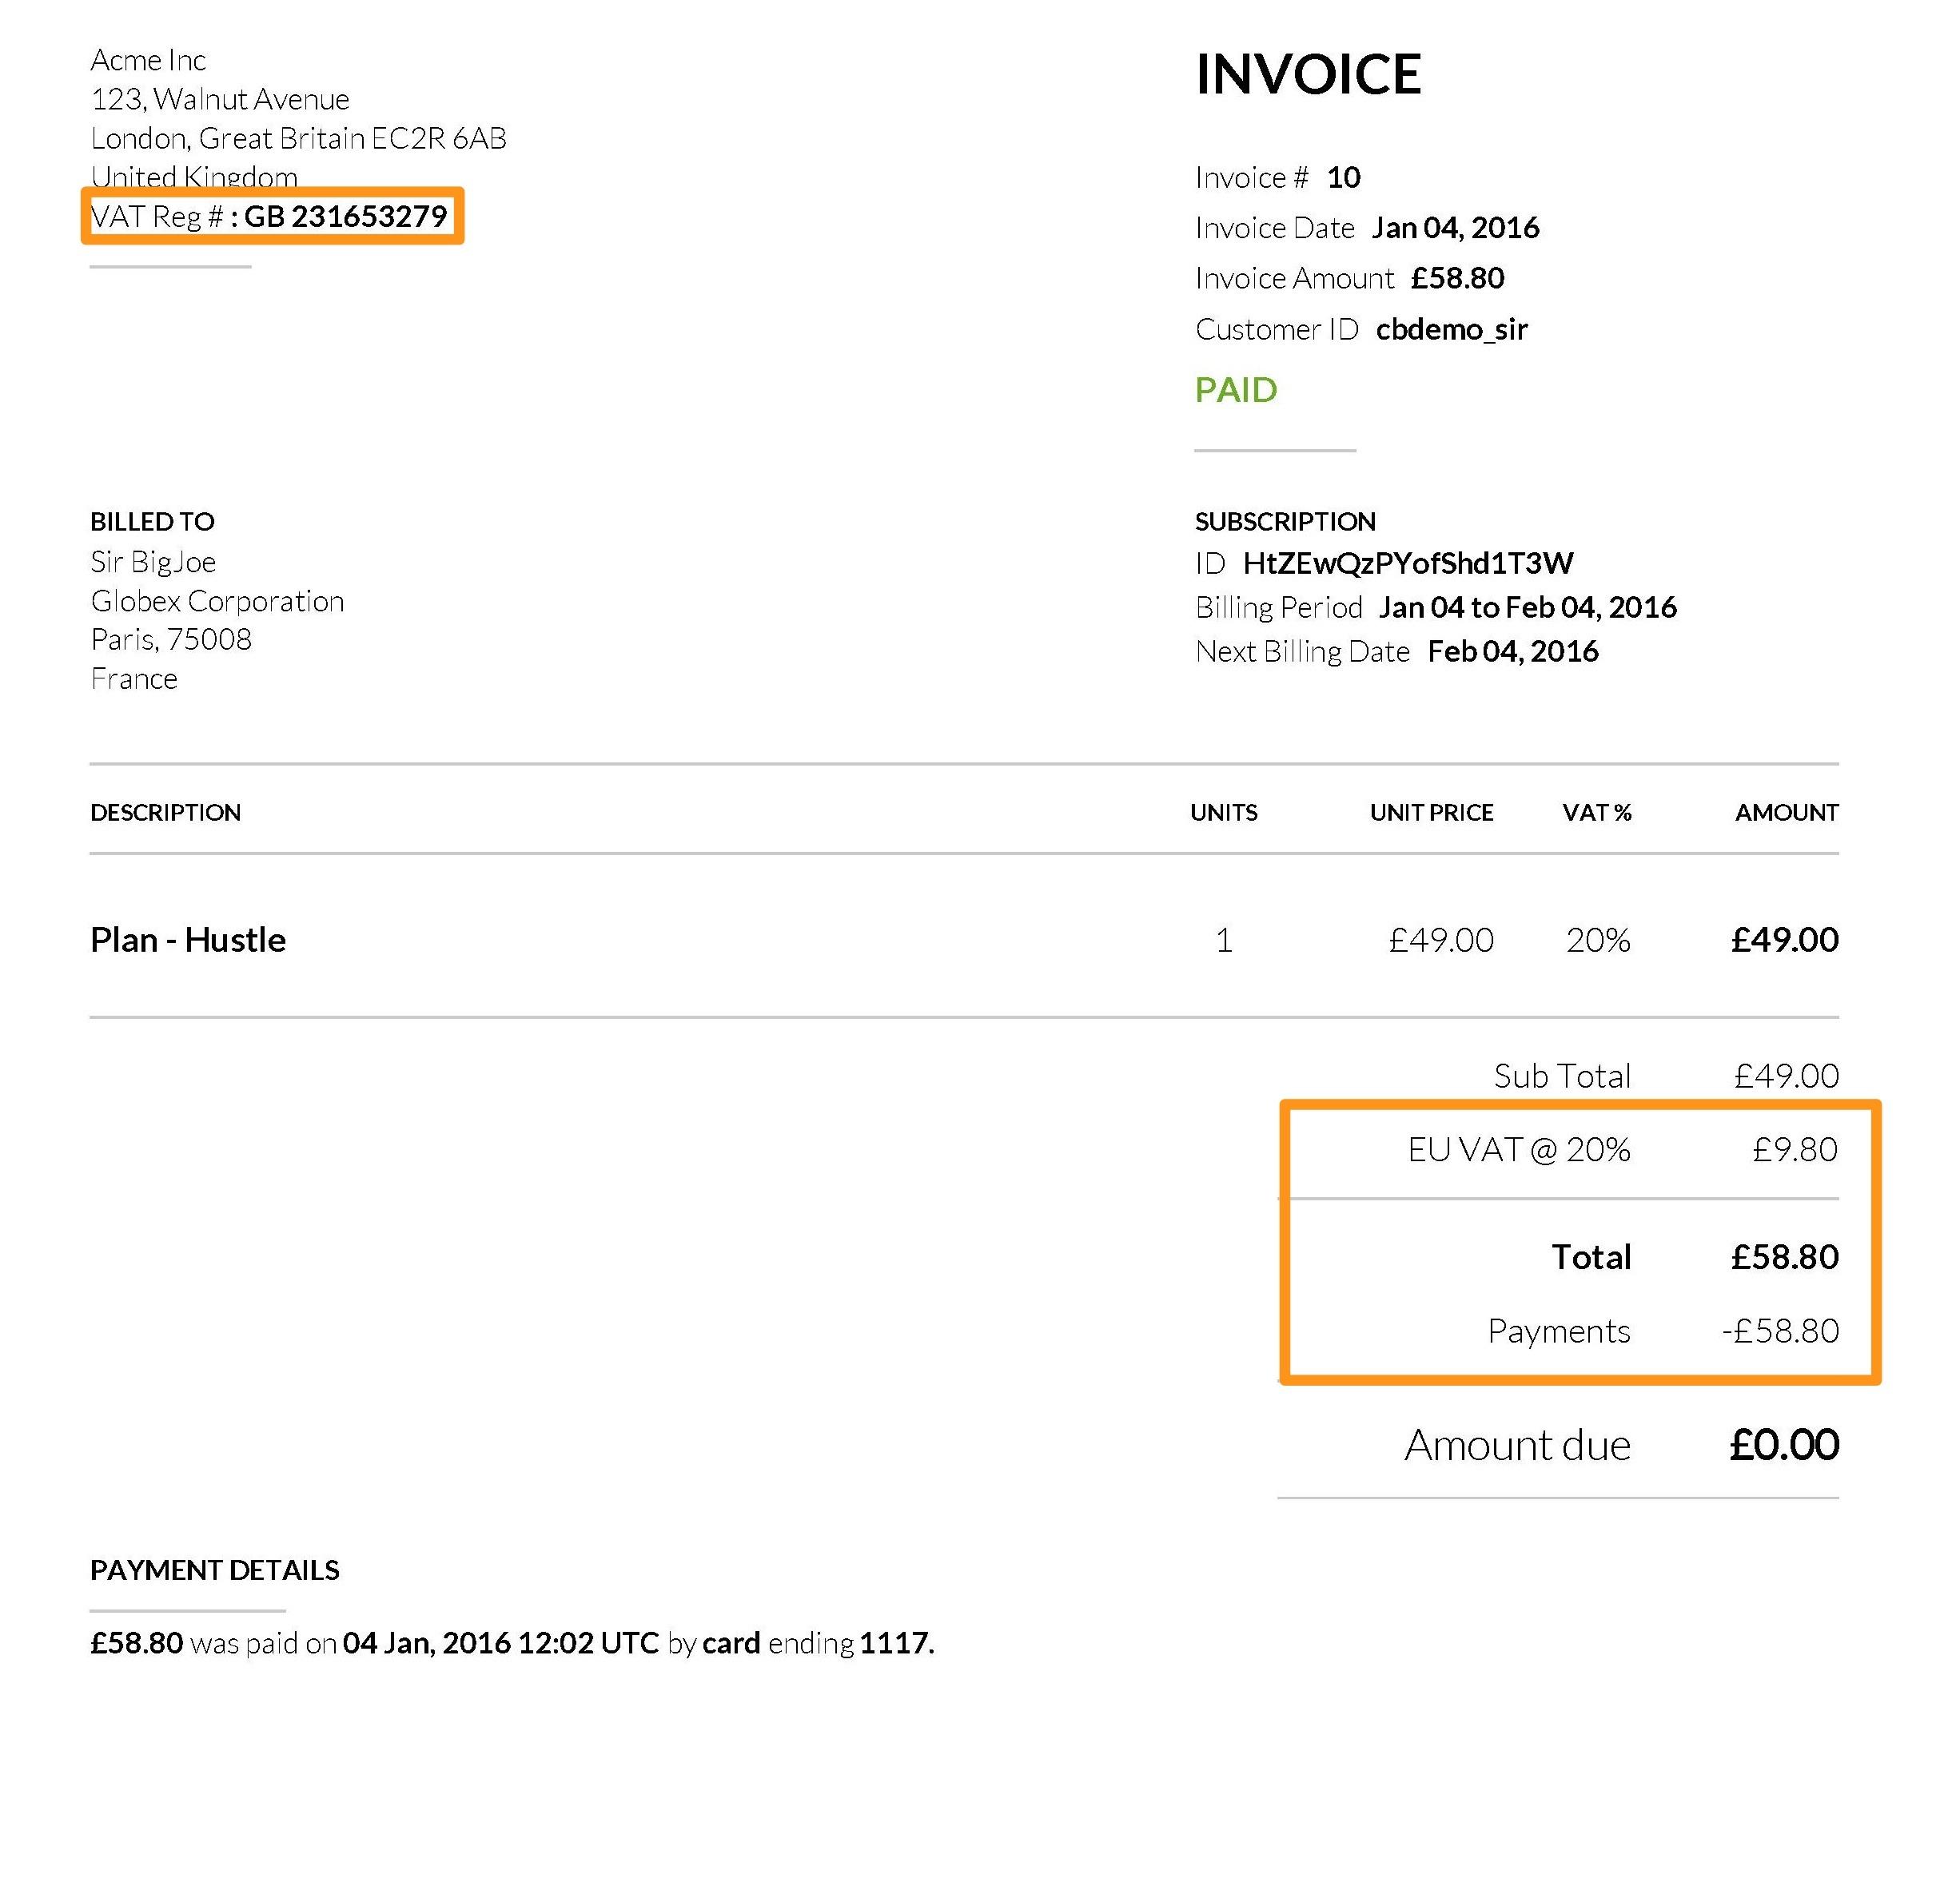 vat on invoice taxes eu vat chargebee docs 2452 X 2370